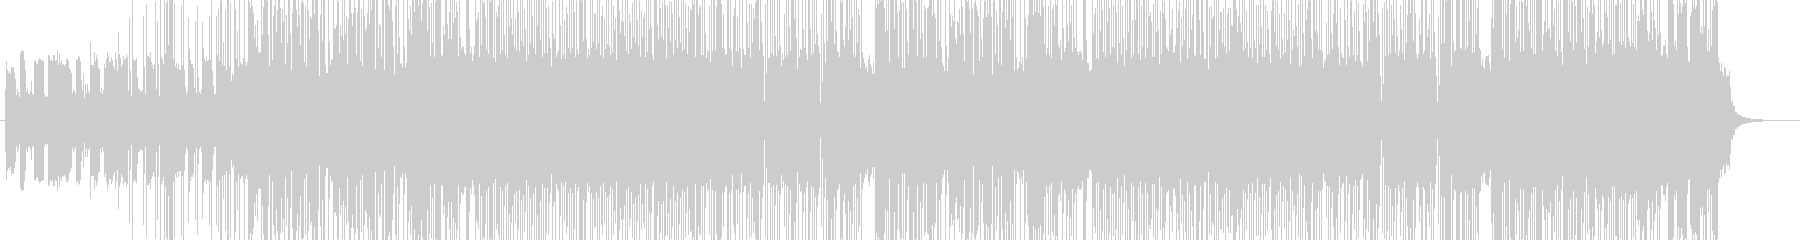 「HR/HM」「DARK」BGM253の未再生の波形